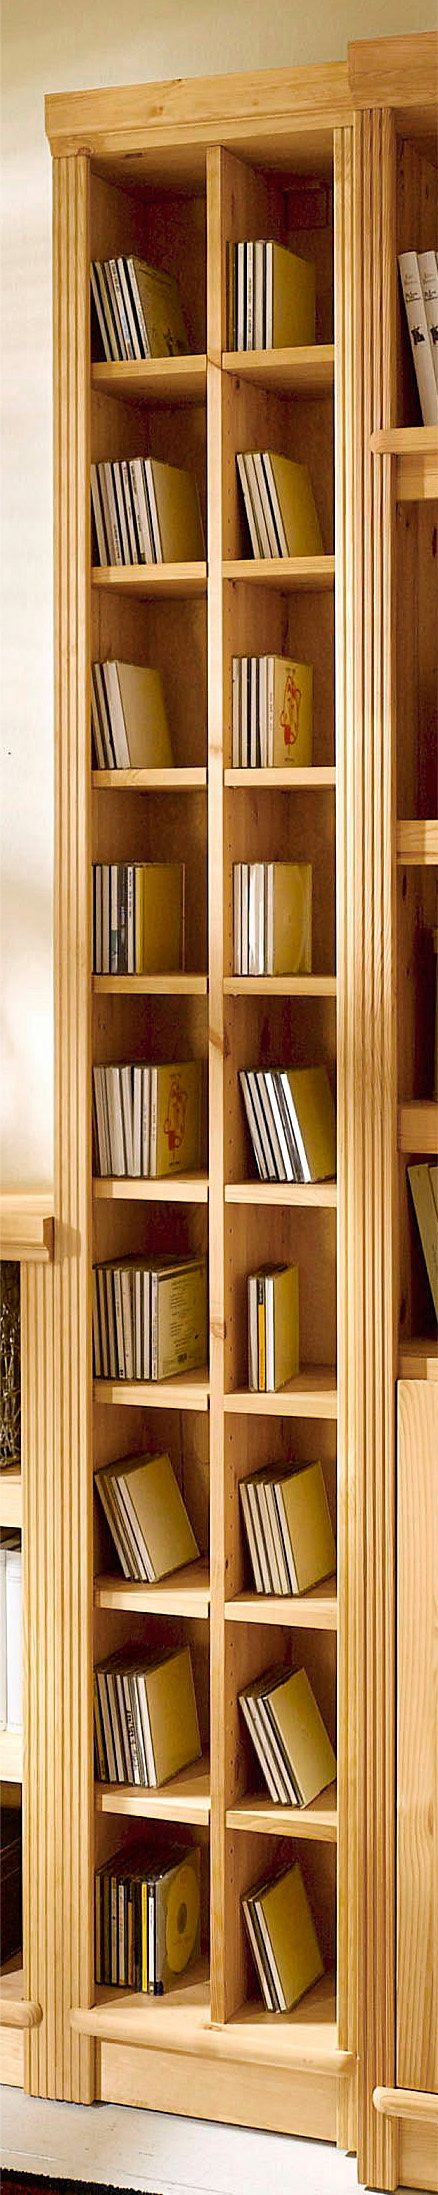 CD-Regal »Serie Soeren«, in 2 Höhen | Wohnzimmer > TV-HiFi-Möbel > CD- & DVD-Regale | SERIE SOEREN